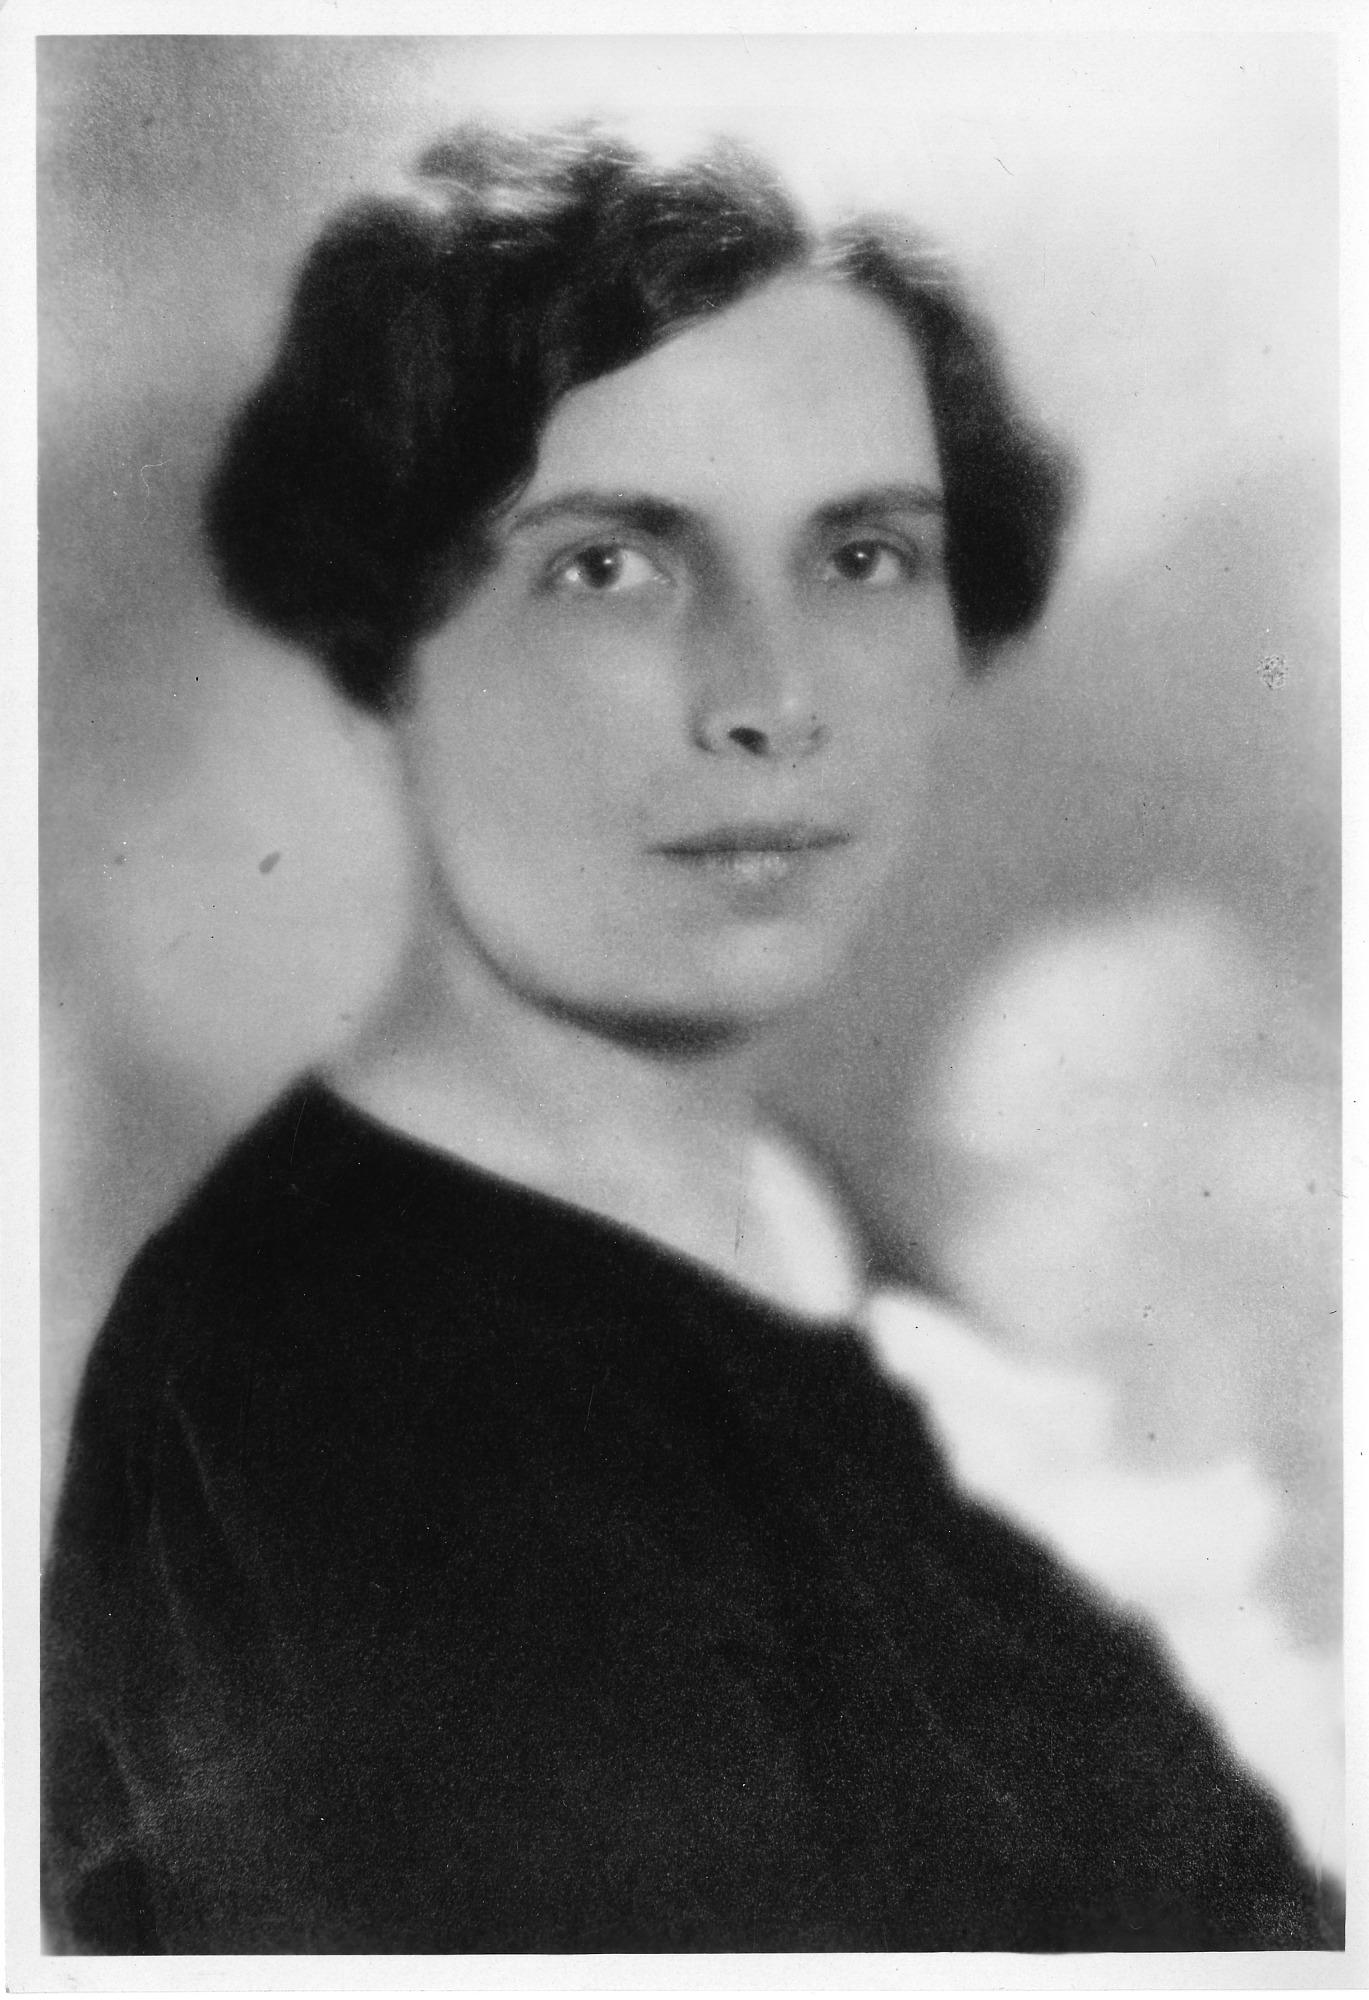 Gladys Rowena Henry Dick (1881-1963) undated